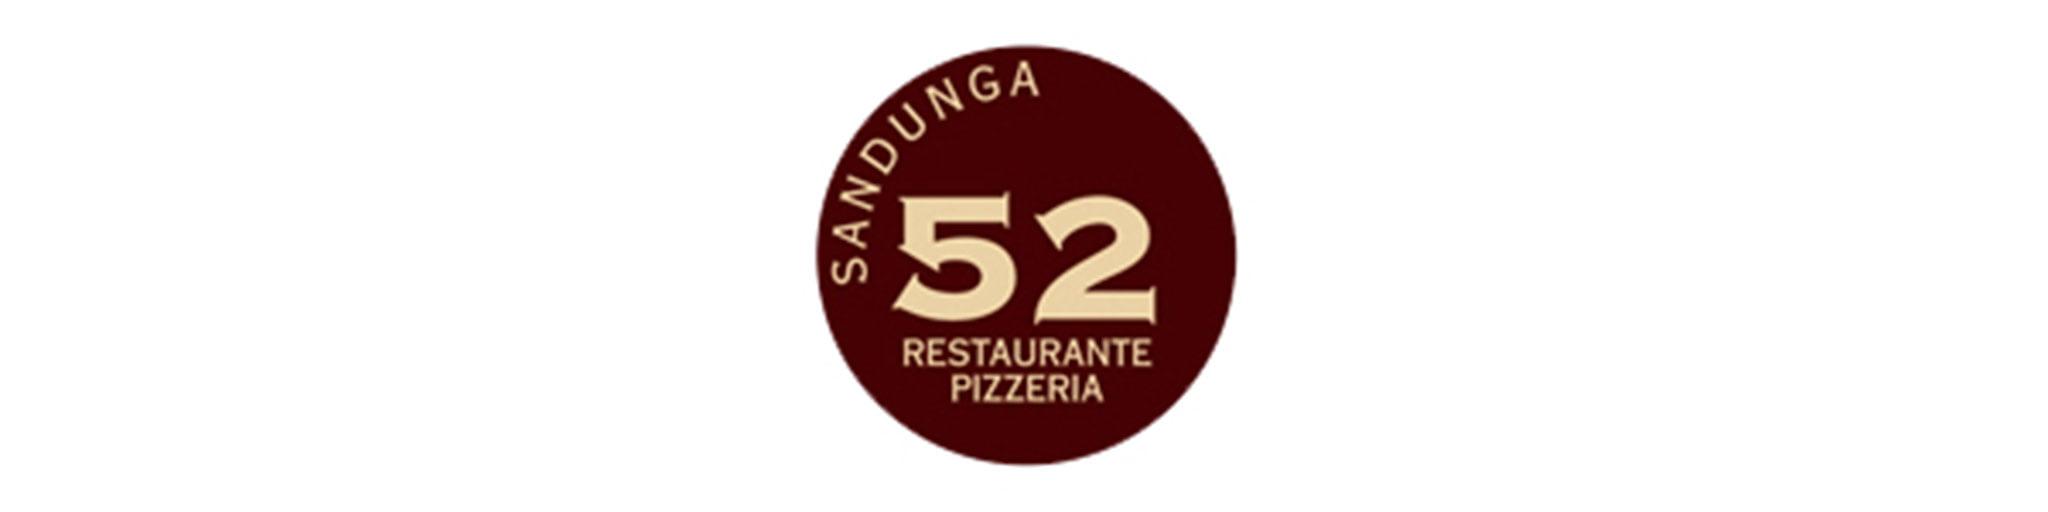 Logotipo de Sandunga 52